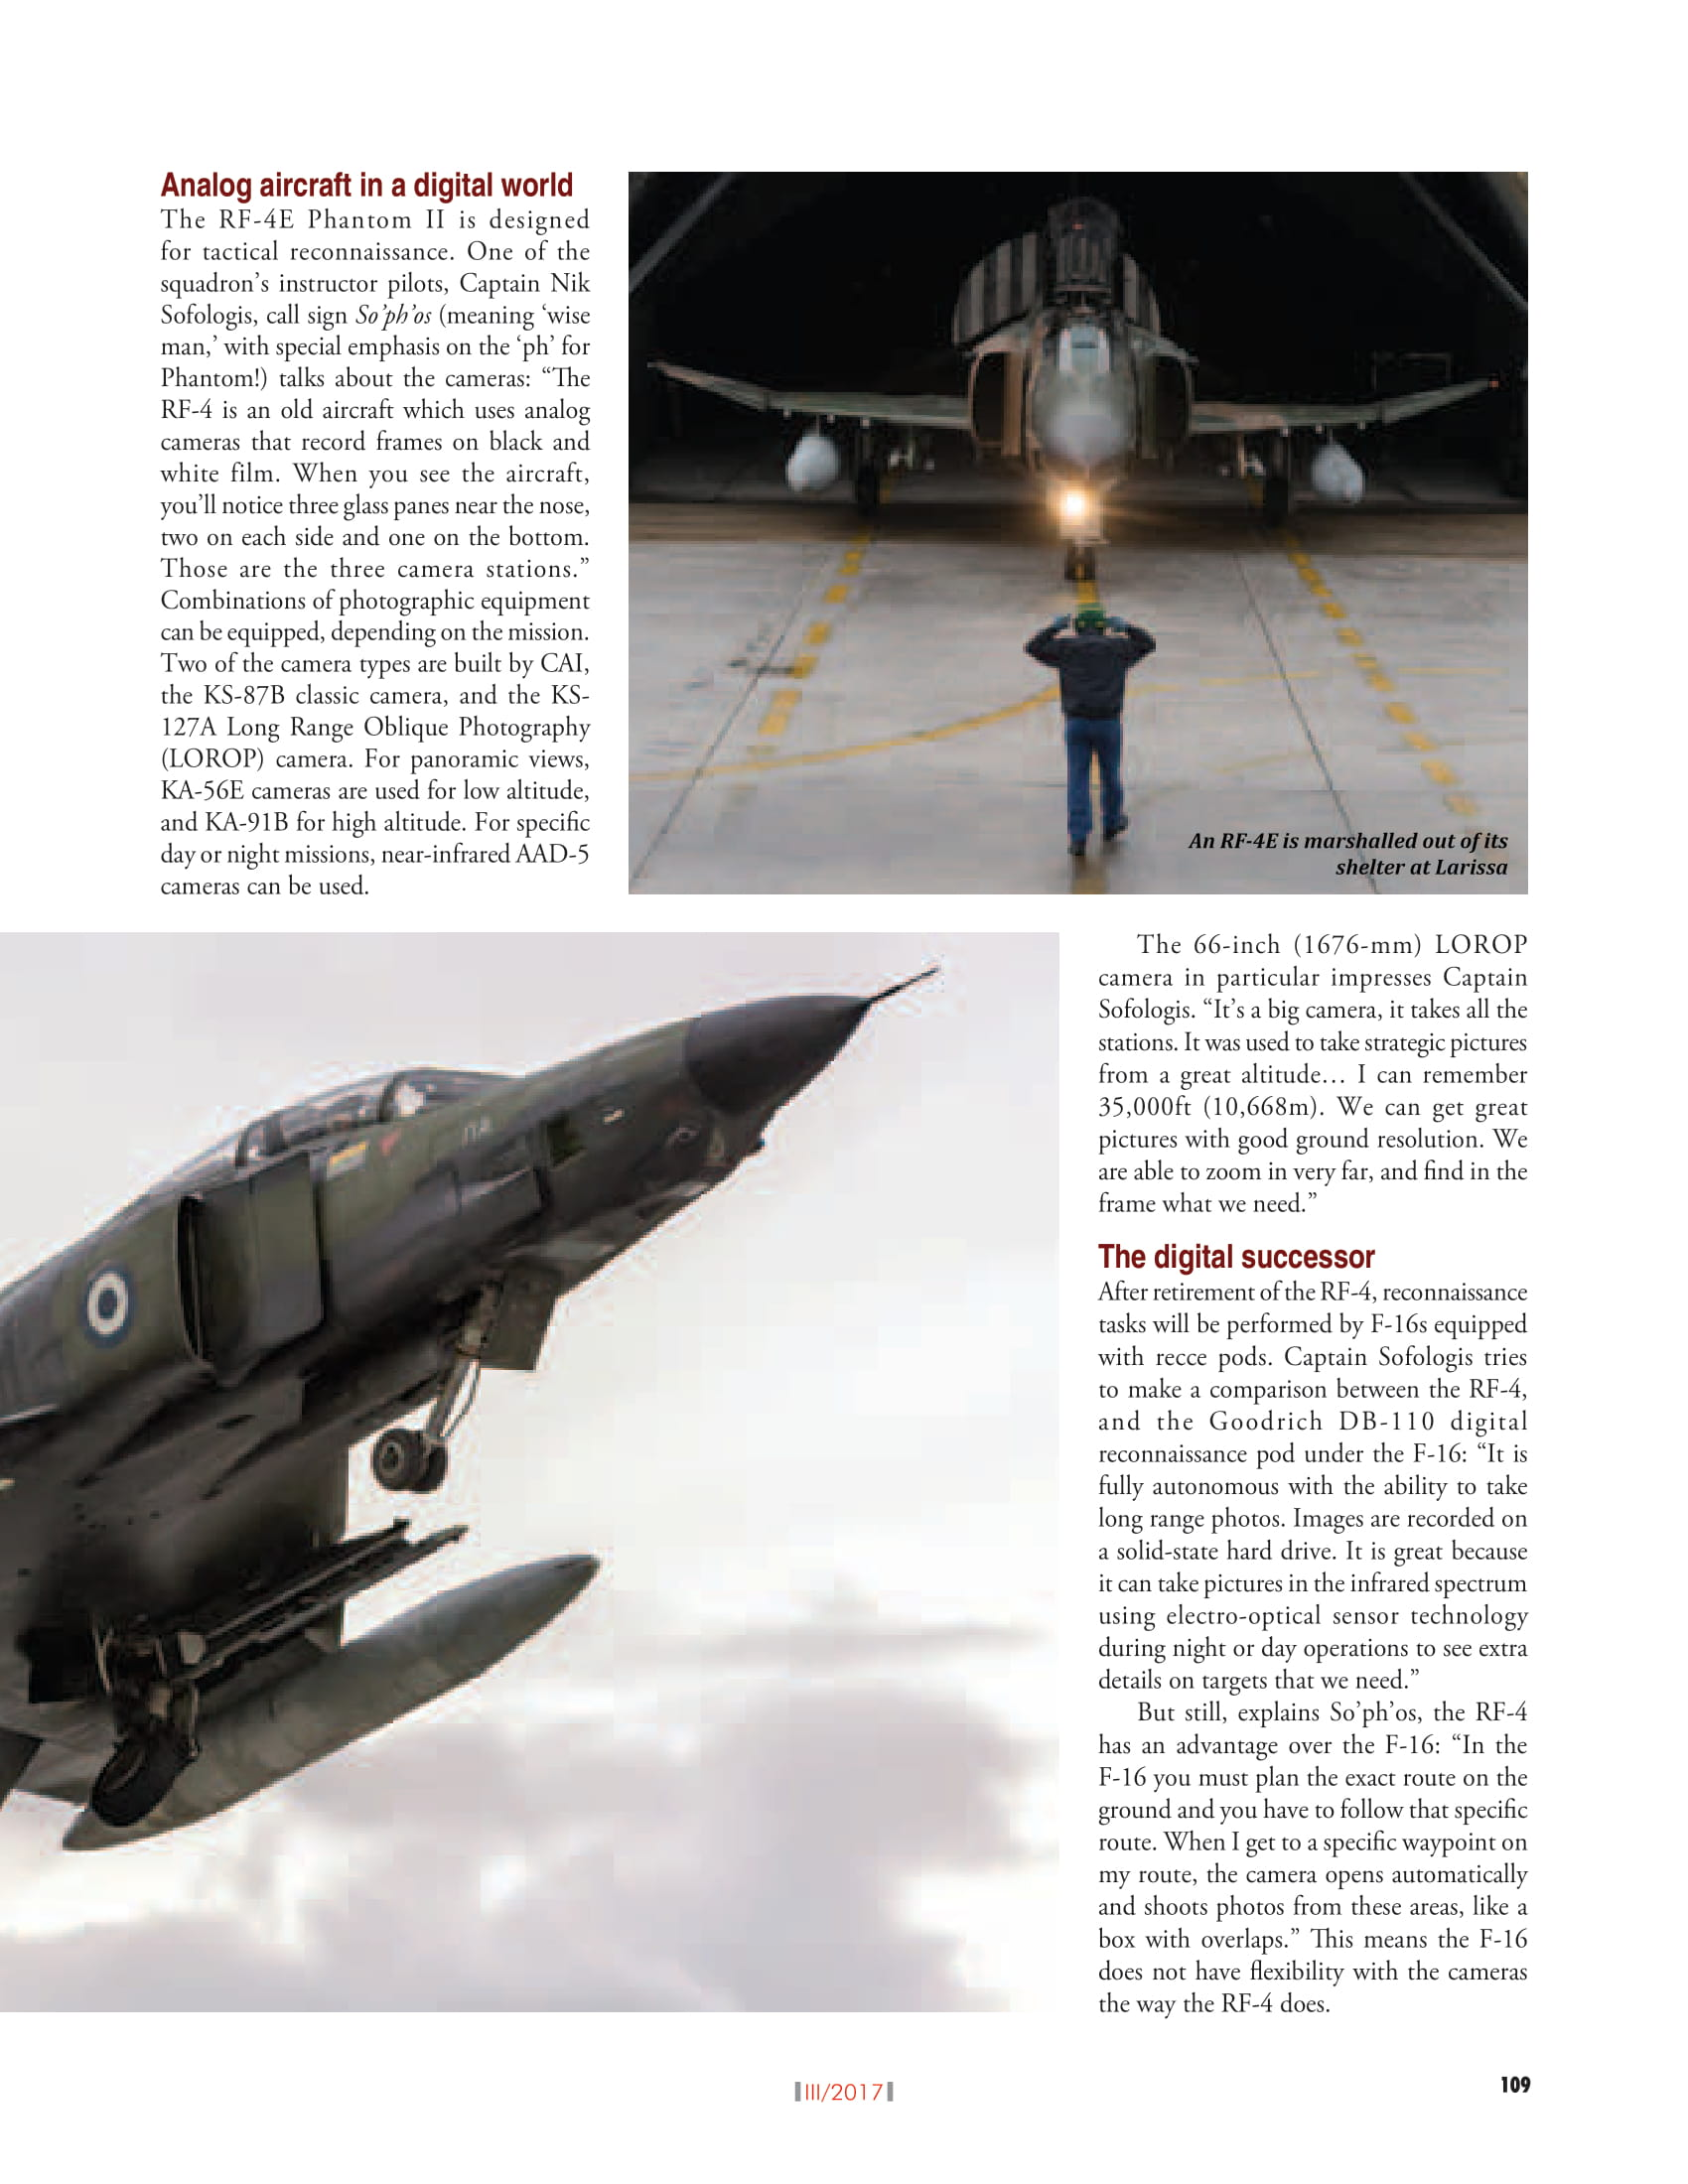 vayu-issue-Vayu-Issue-III-May-June-2017-111